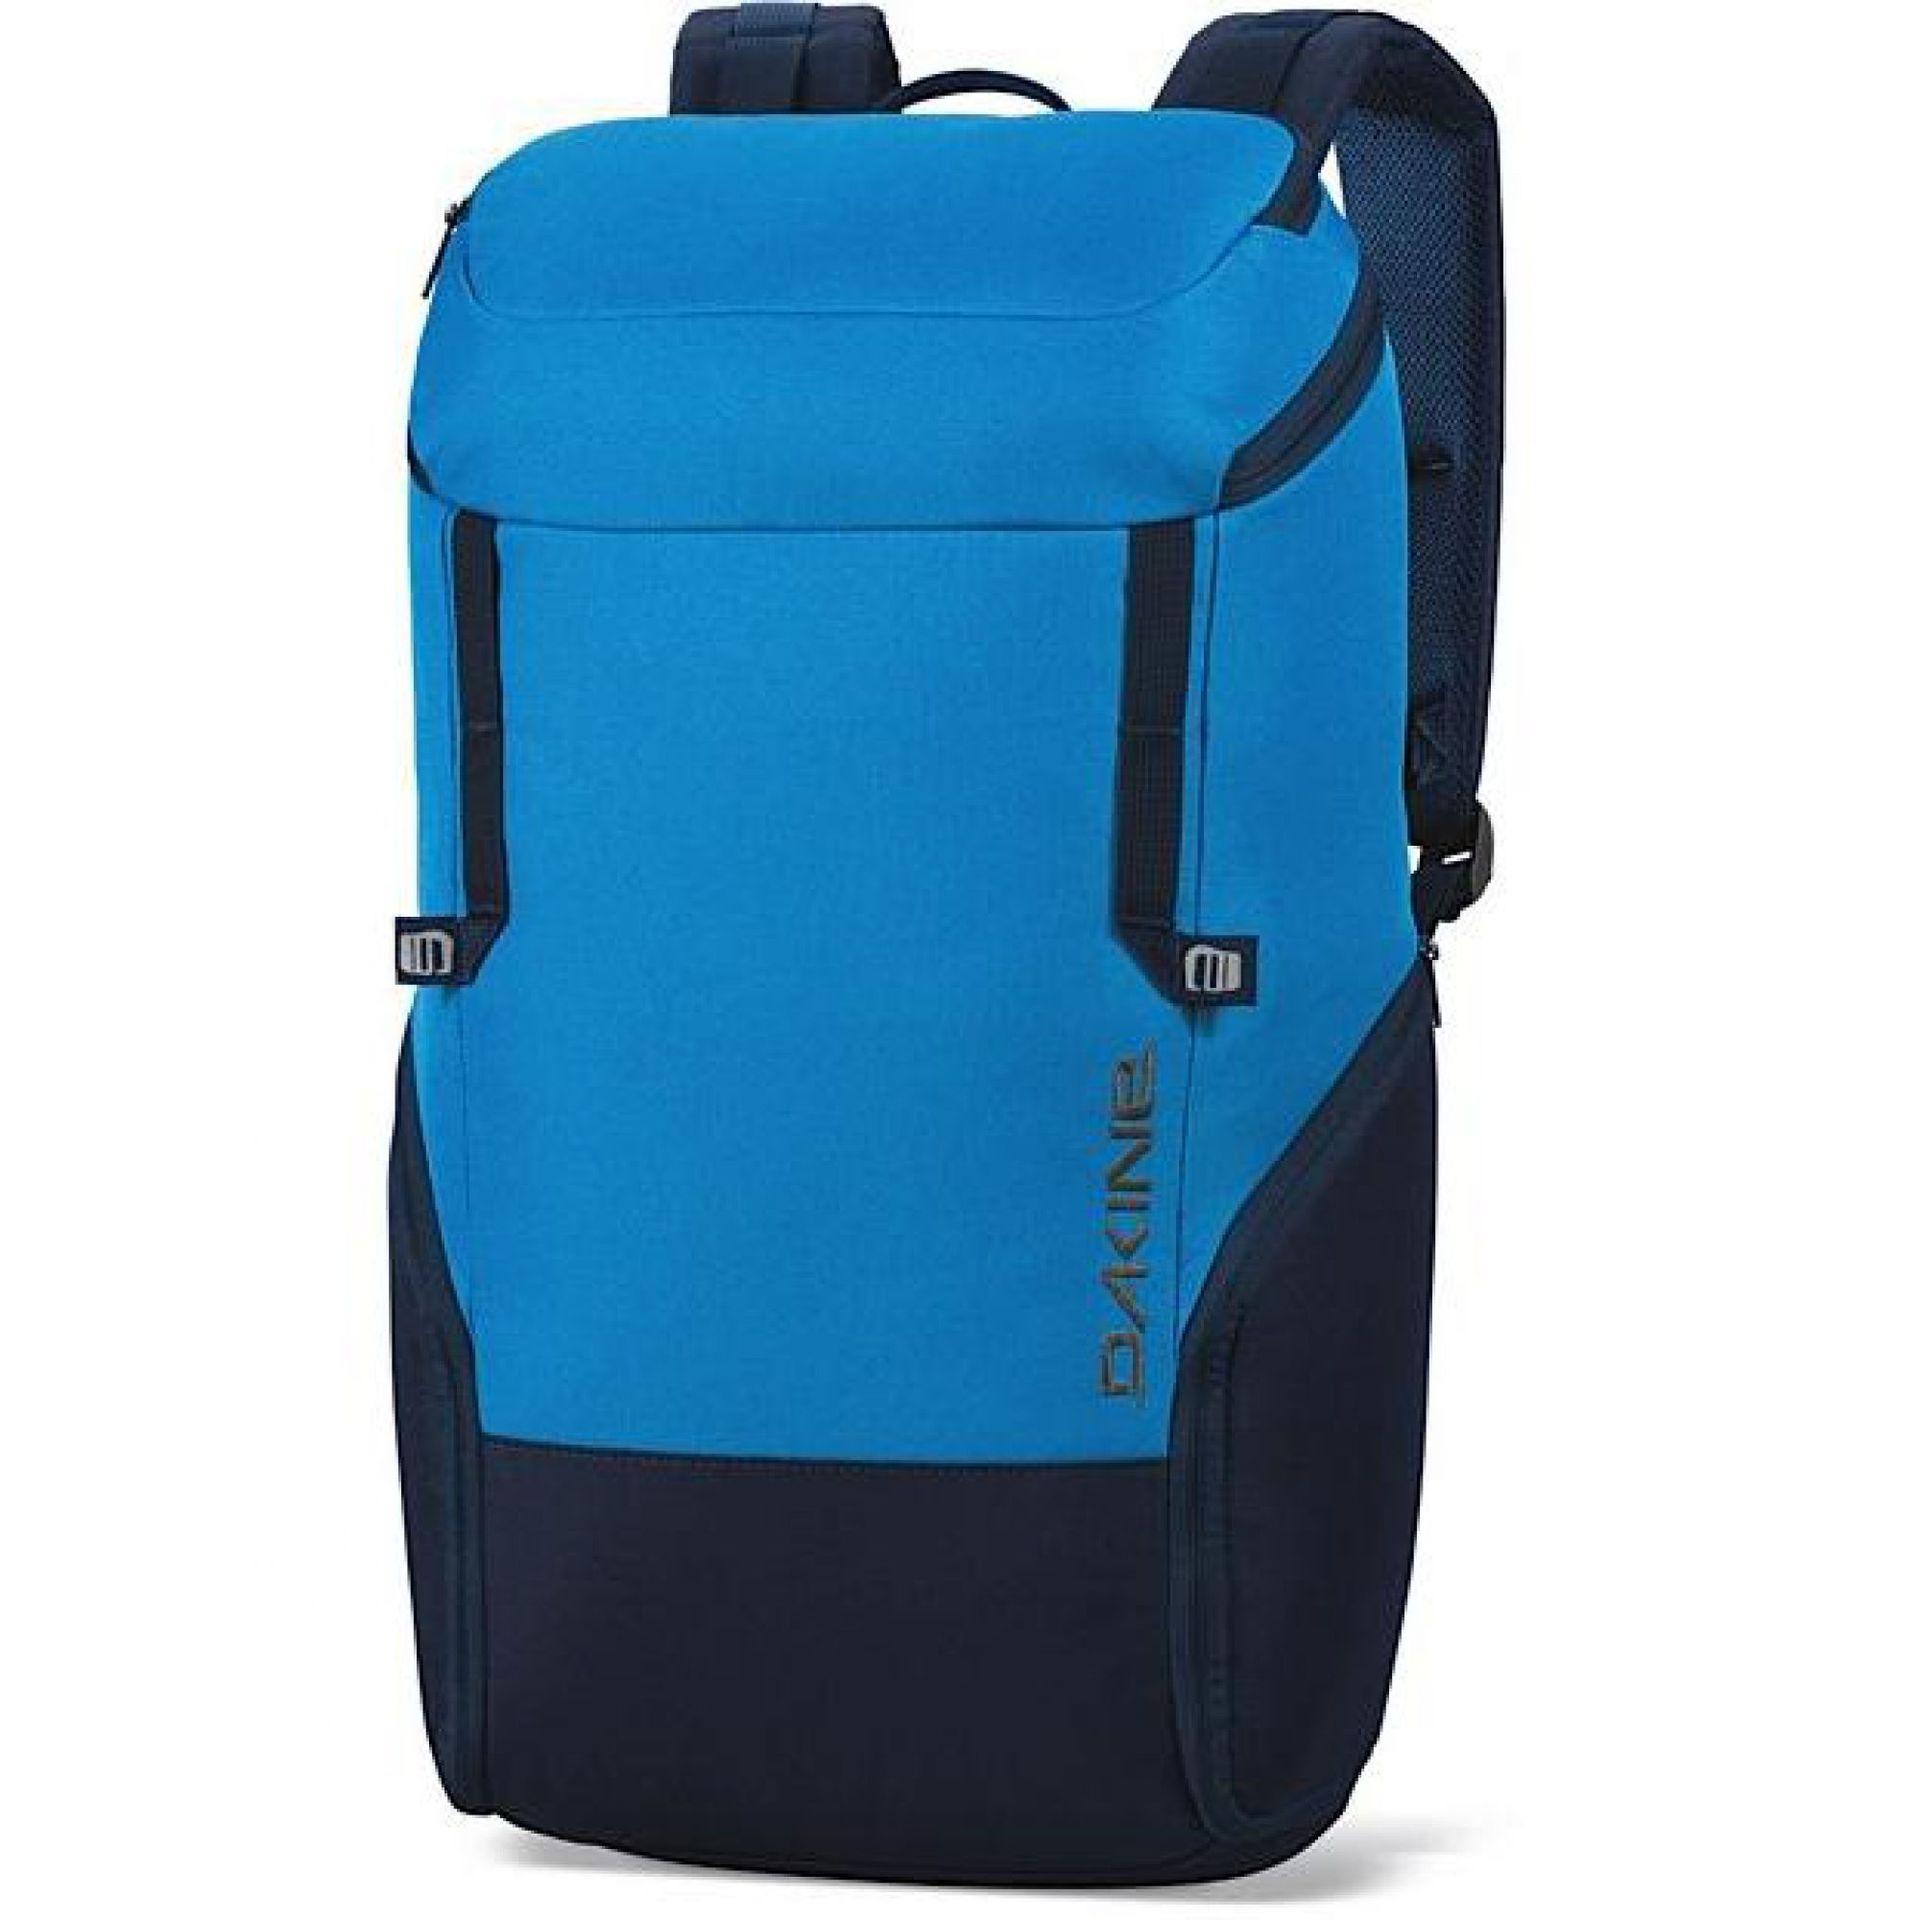 PLECAK TORBA NA BUTY DAKINE TRANSFER BOOT PACK BLUES